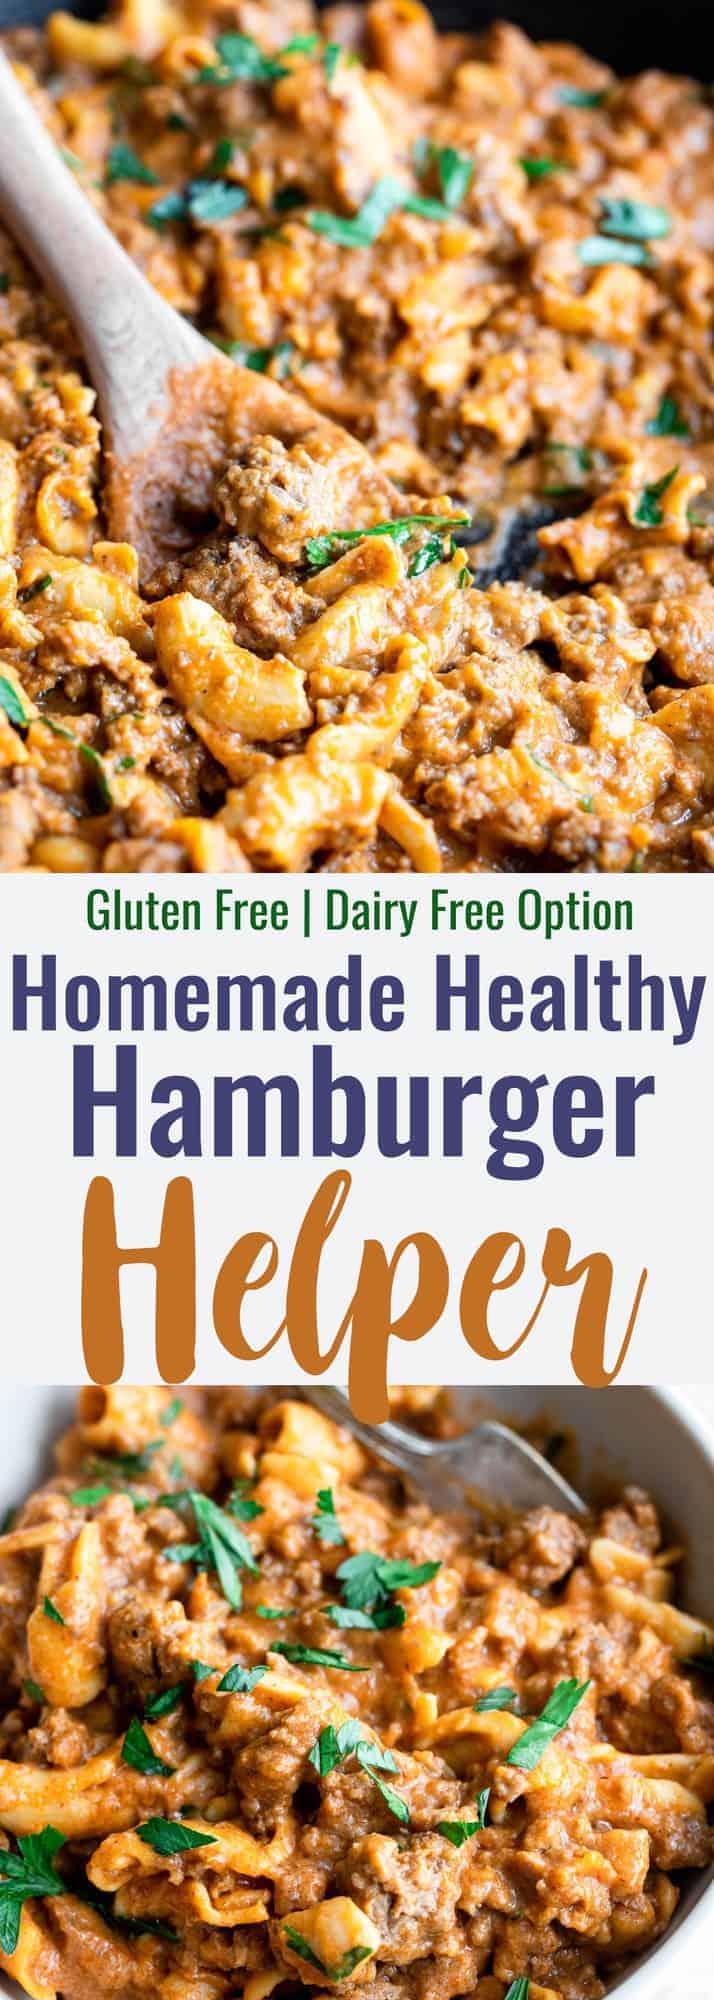 Homemade Healthy Hamburger Helper Food Faith Fitness